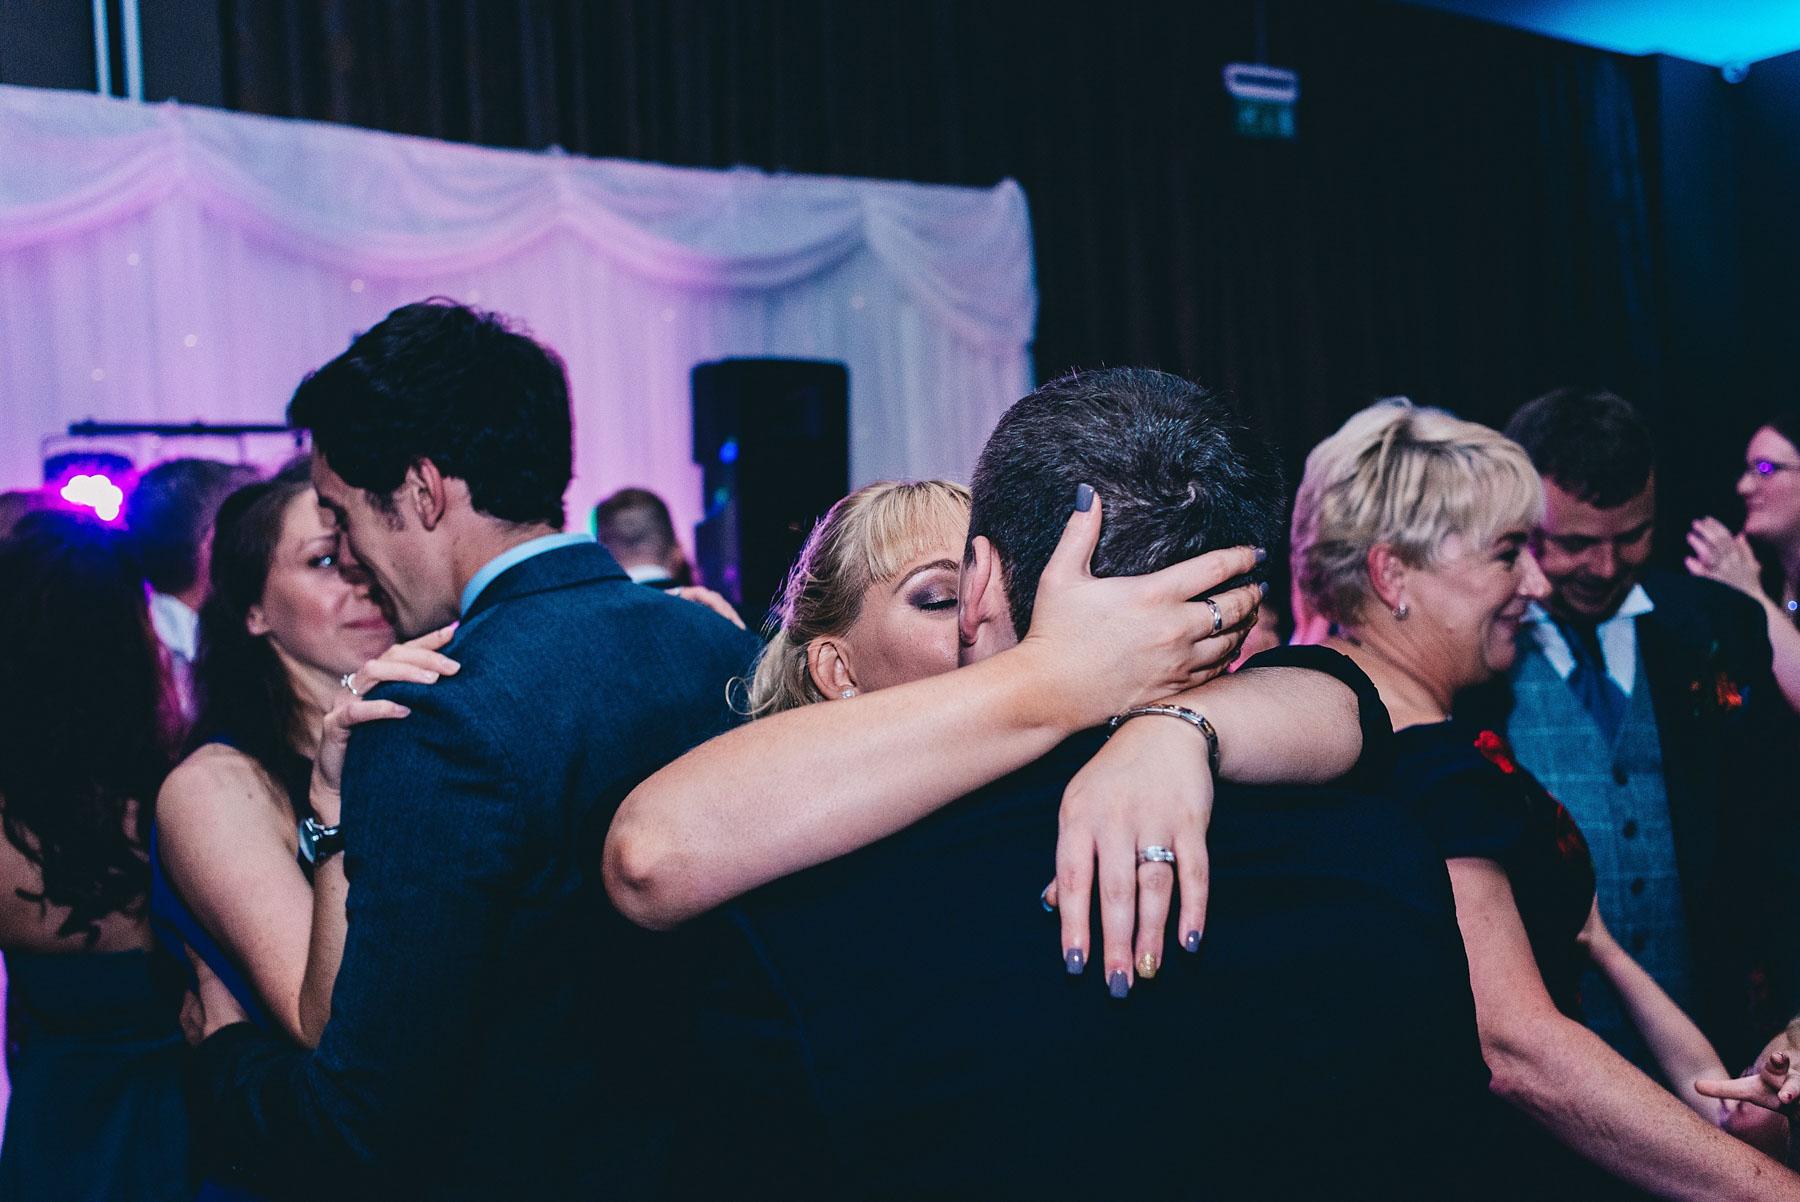 Woman kisses man on the dancefloor of wedding